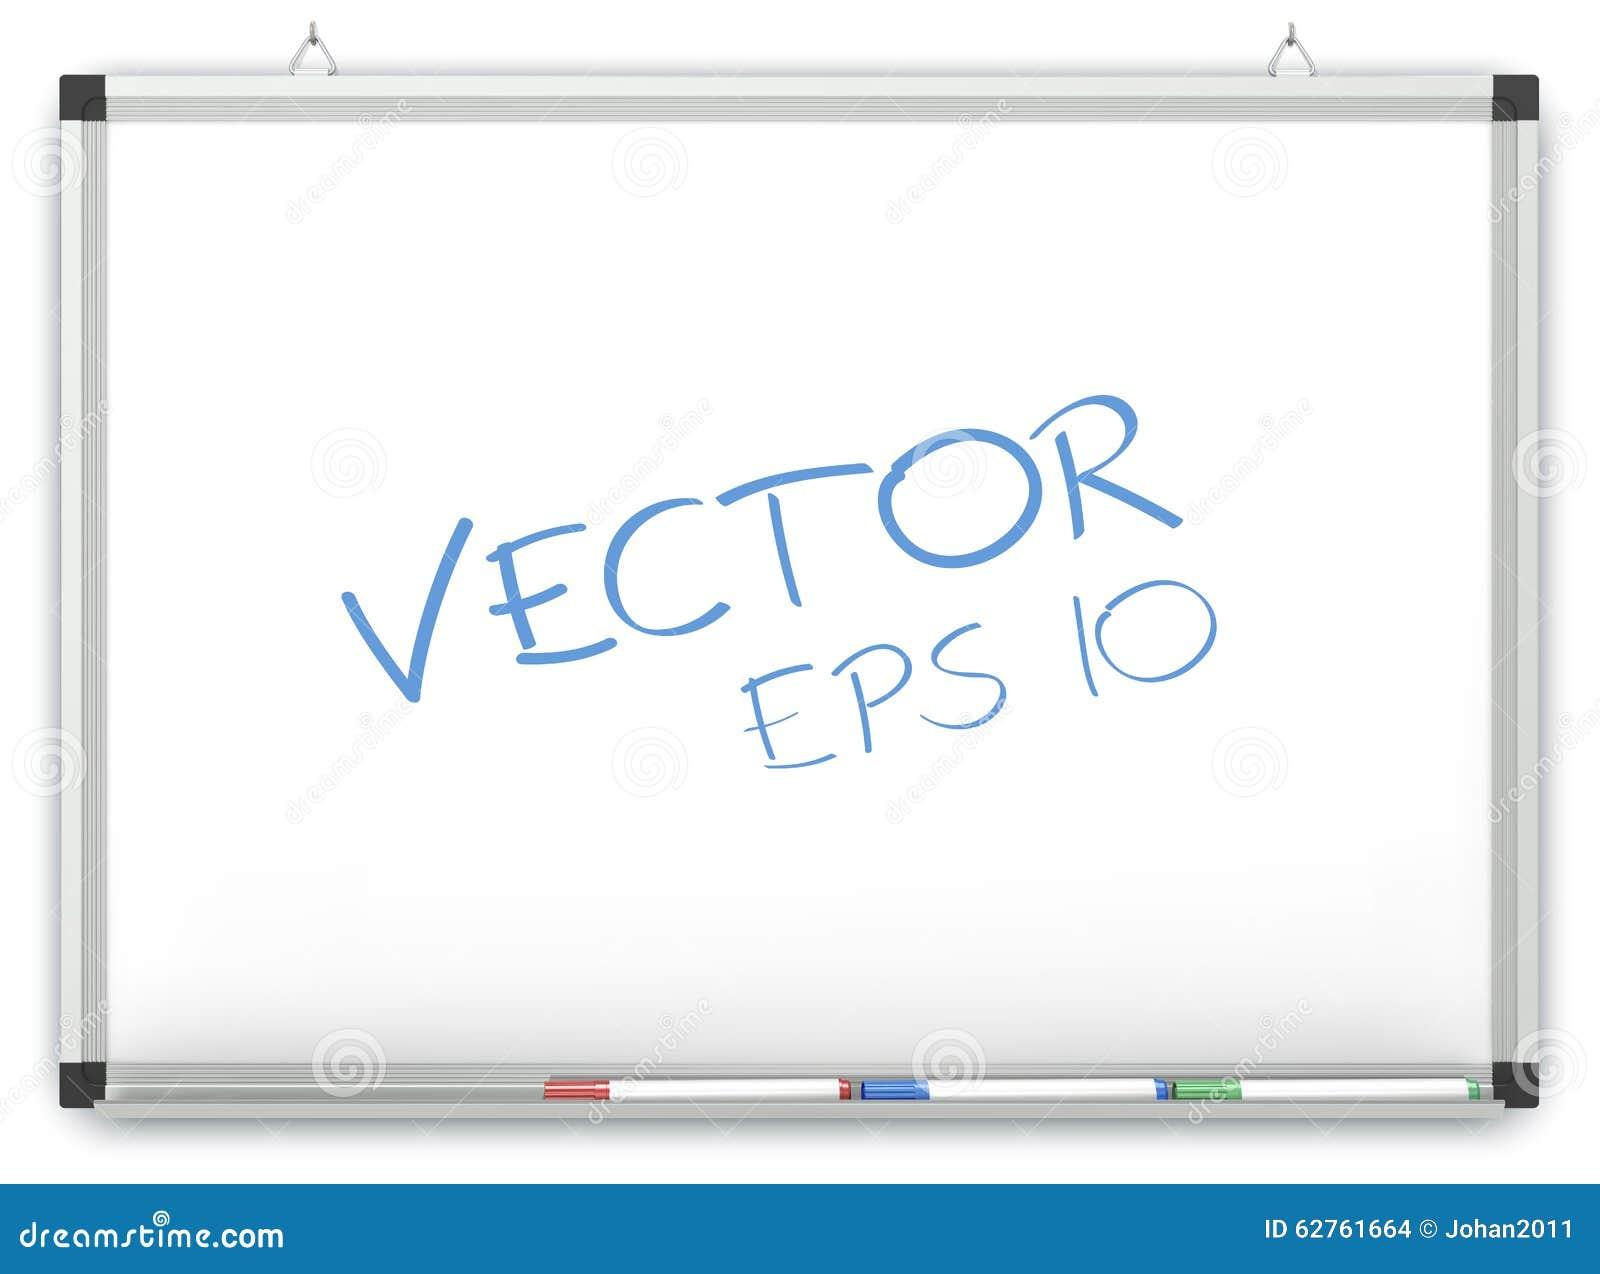 Vectorwhiteboard